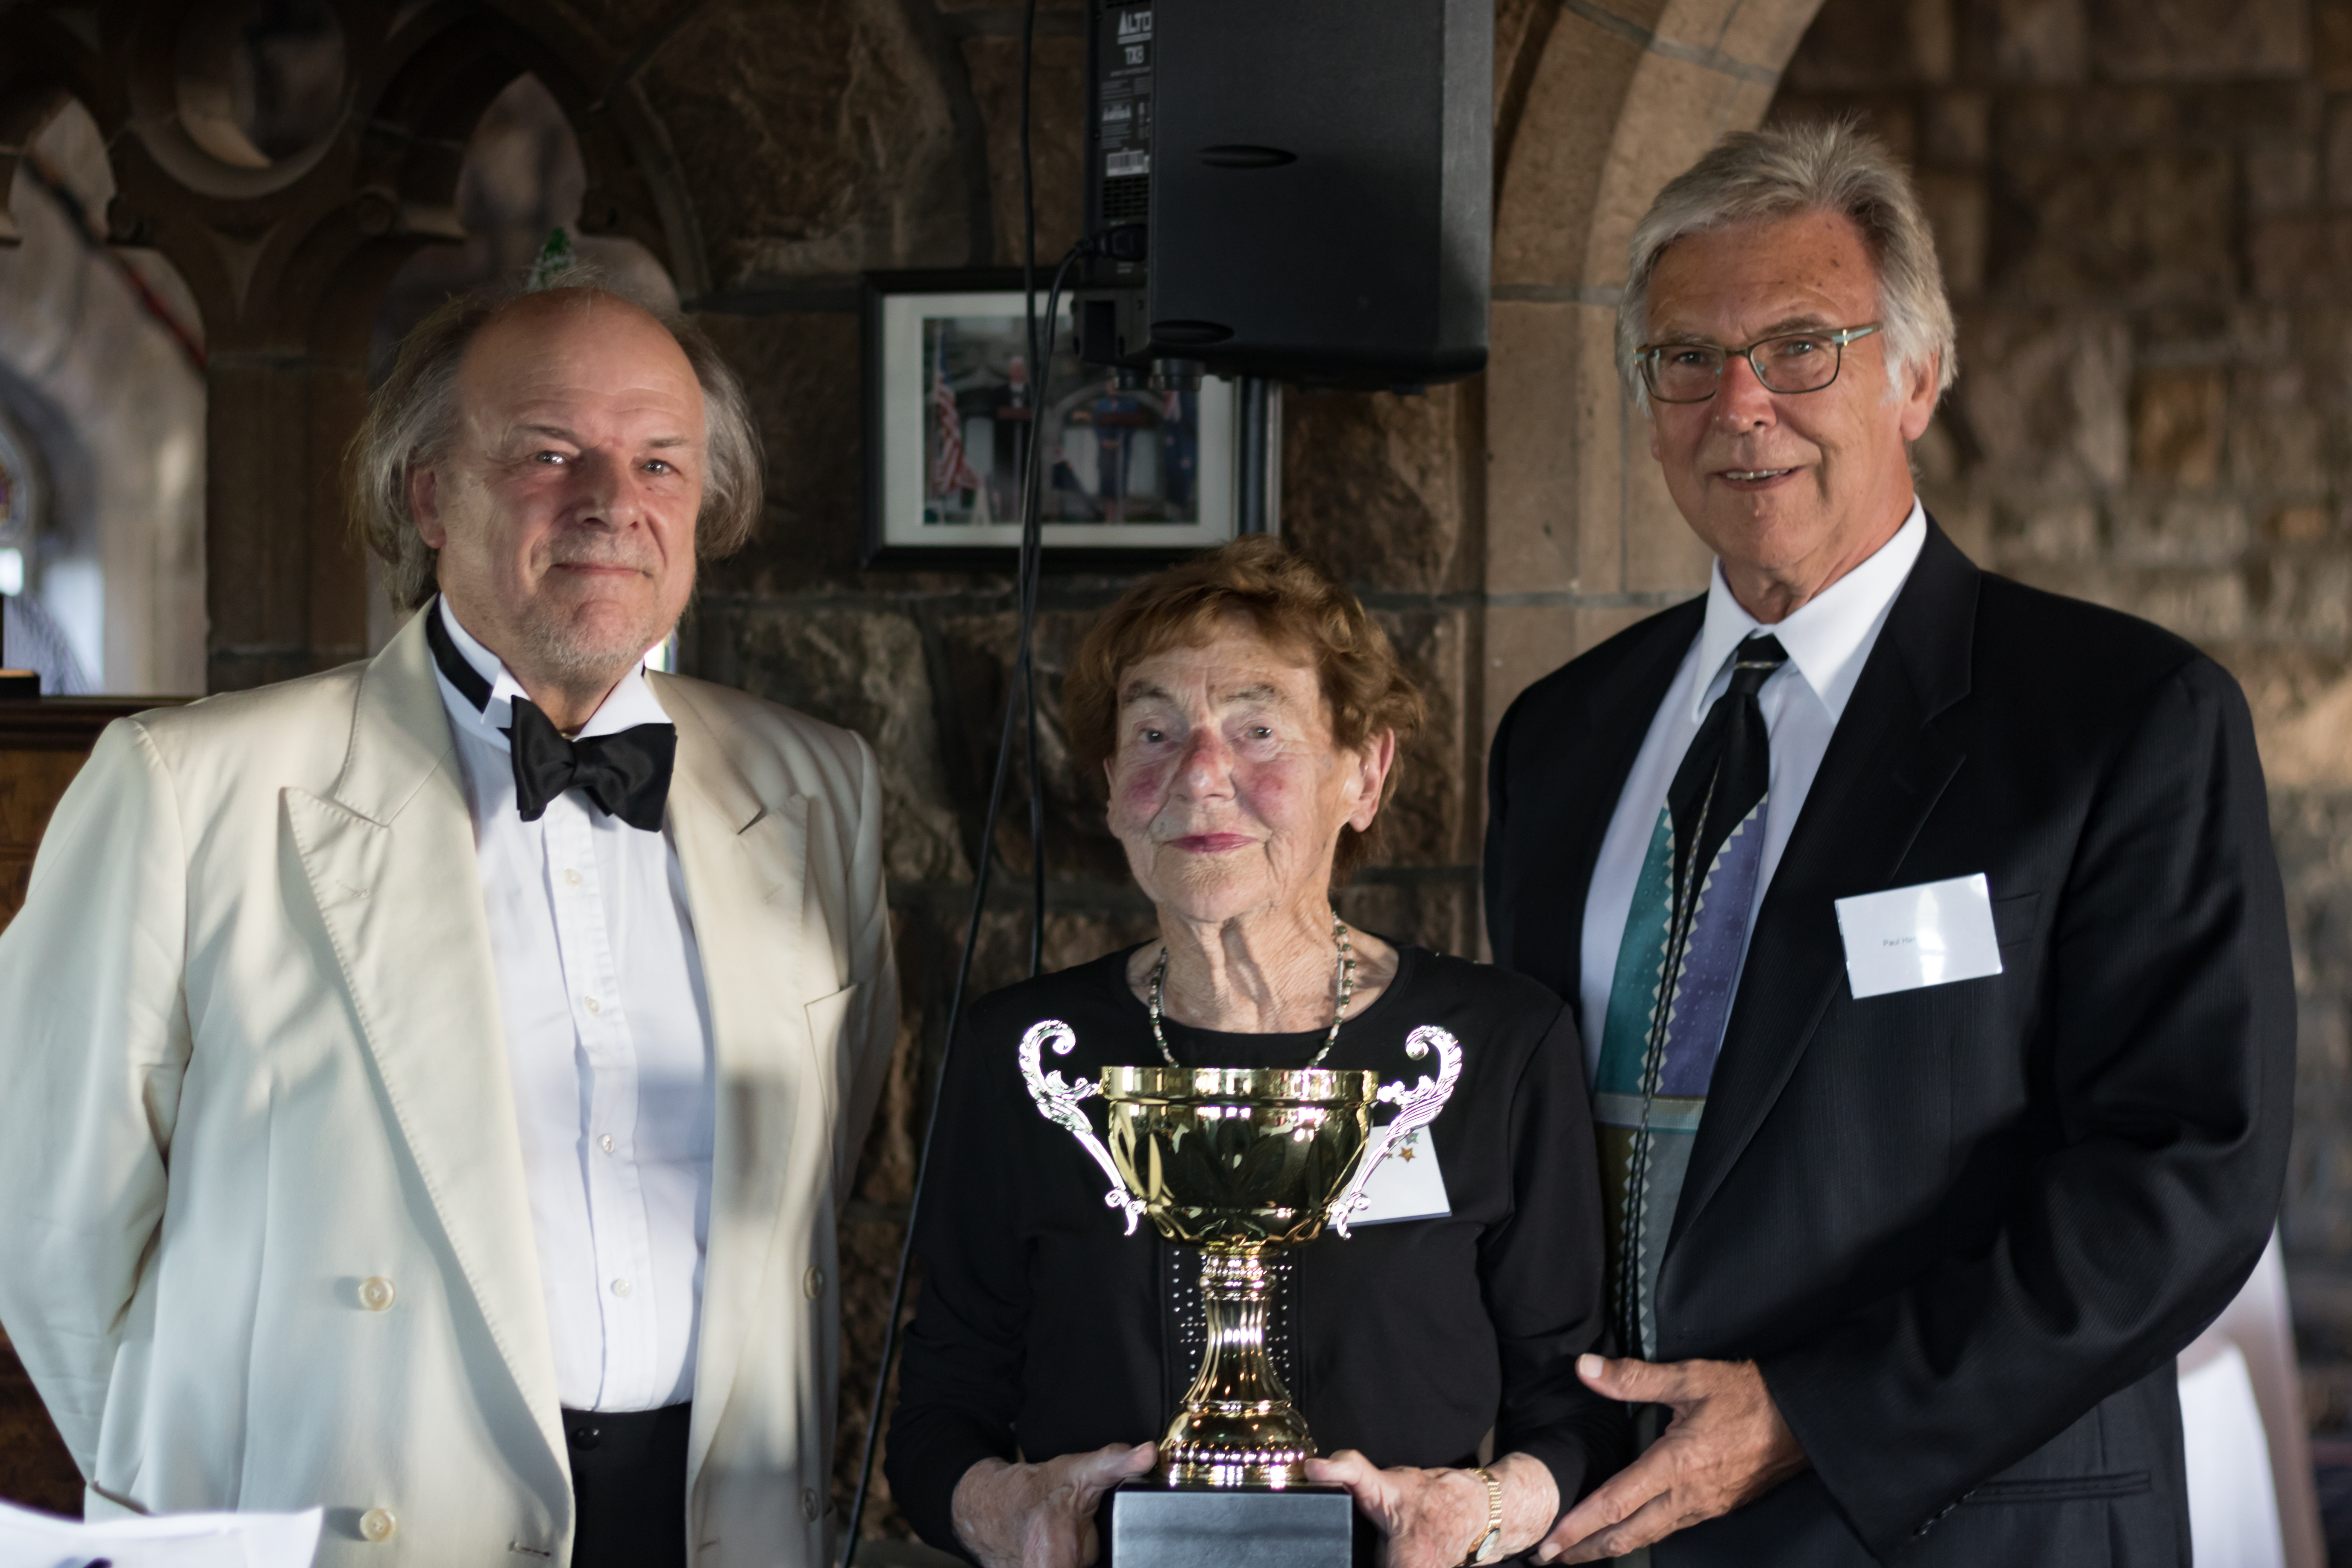 Haydn Rawstron, Evelyn Harding and Paul Harding